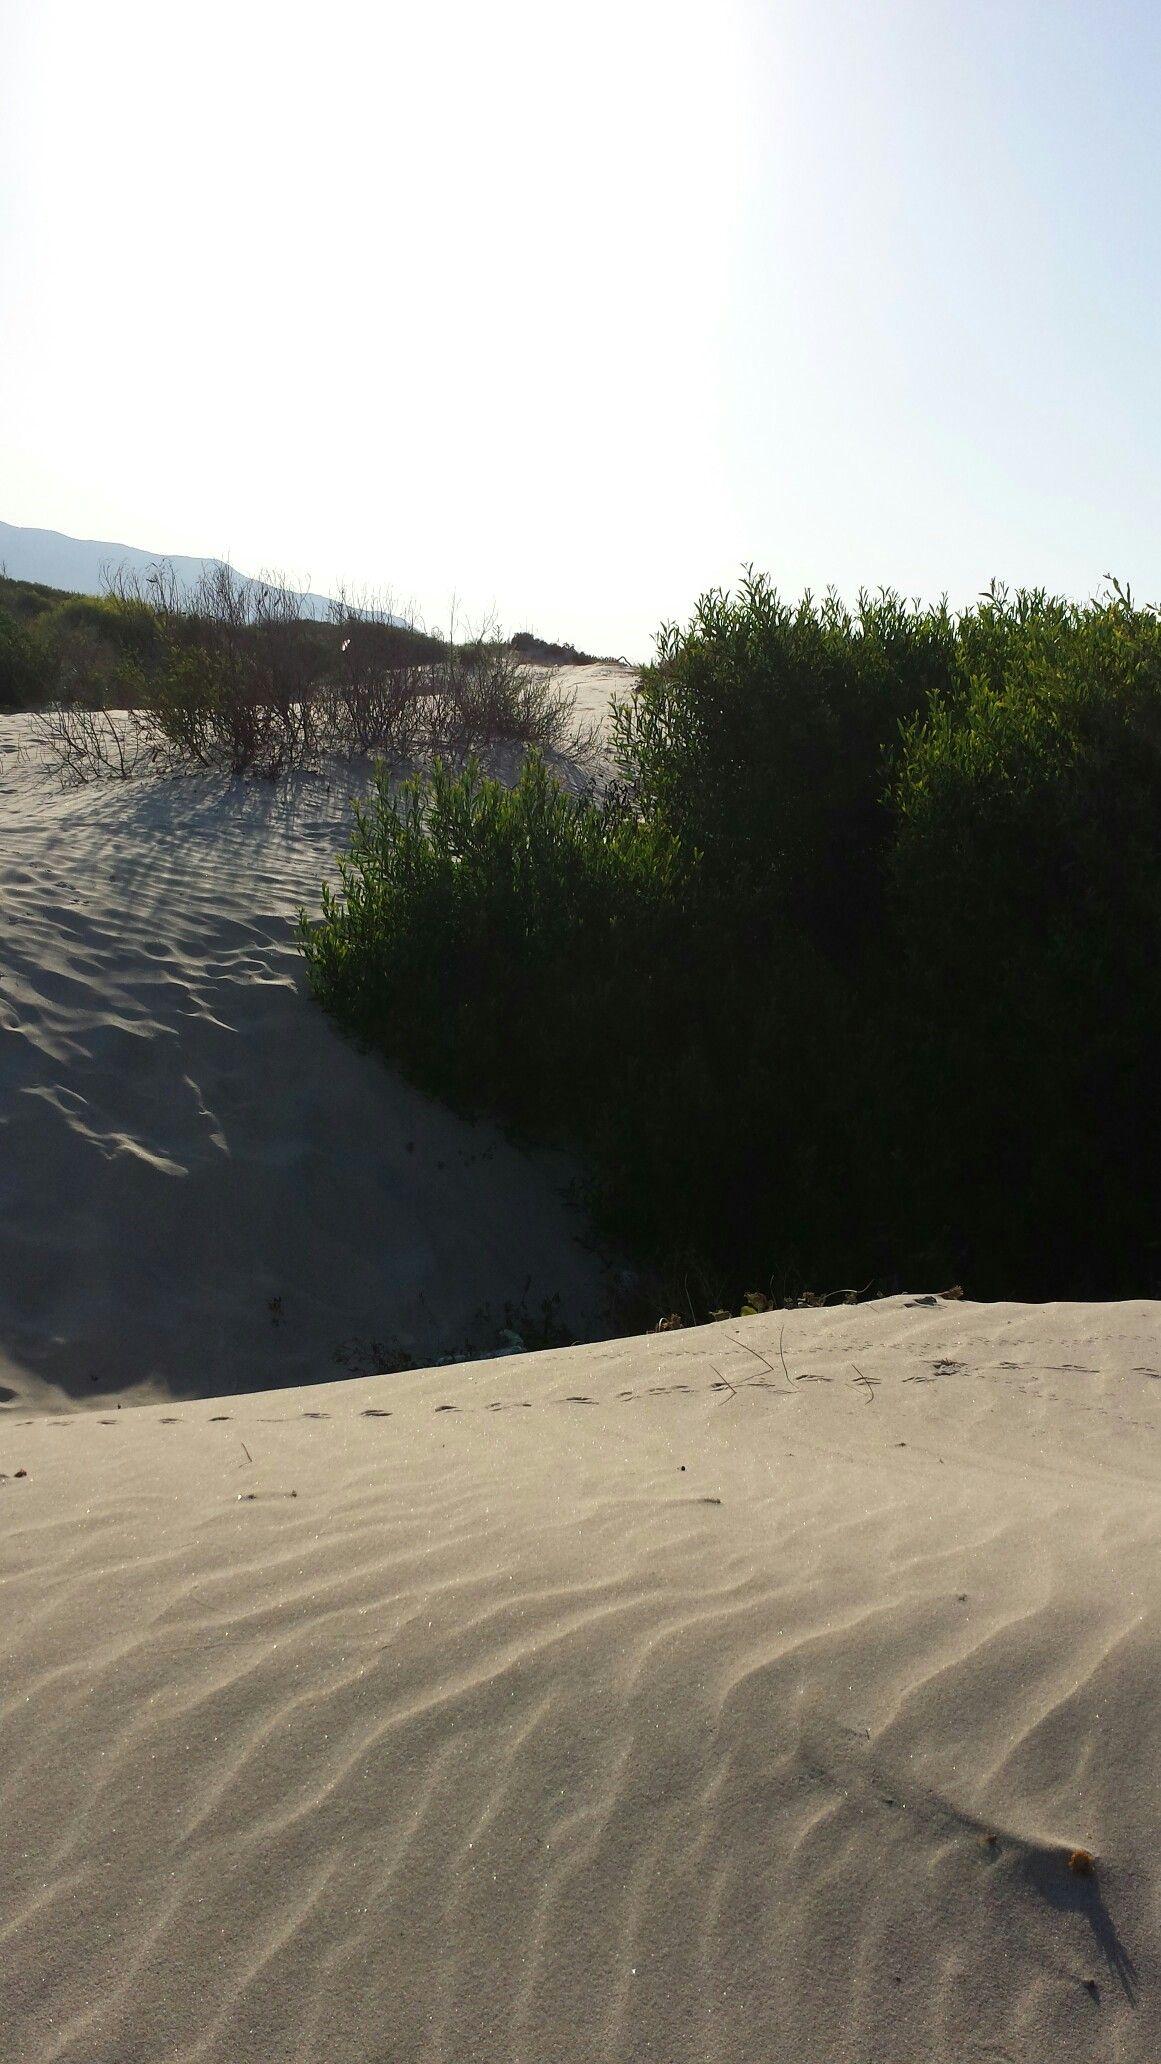 Tunisie  Borj Cedria  La pinède